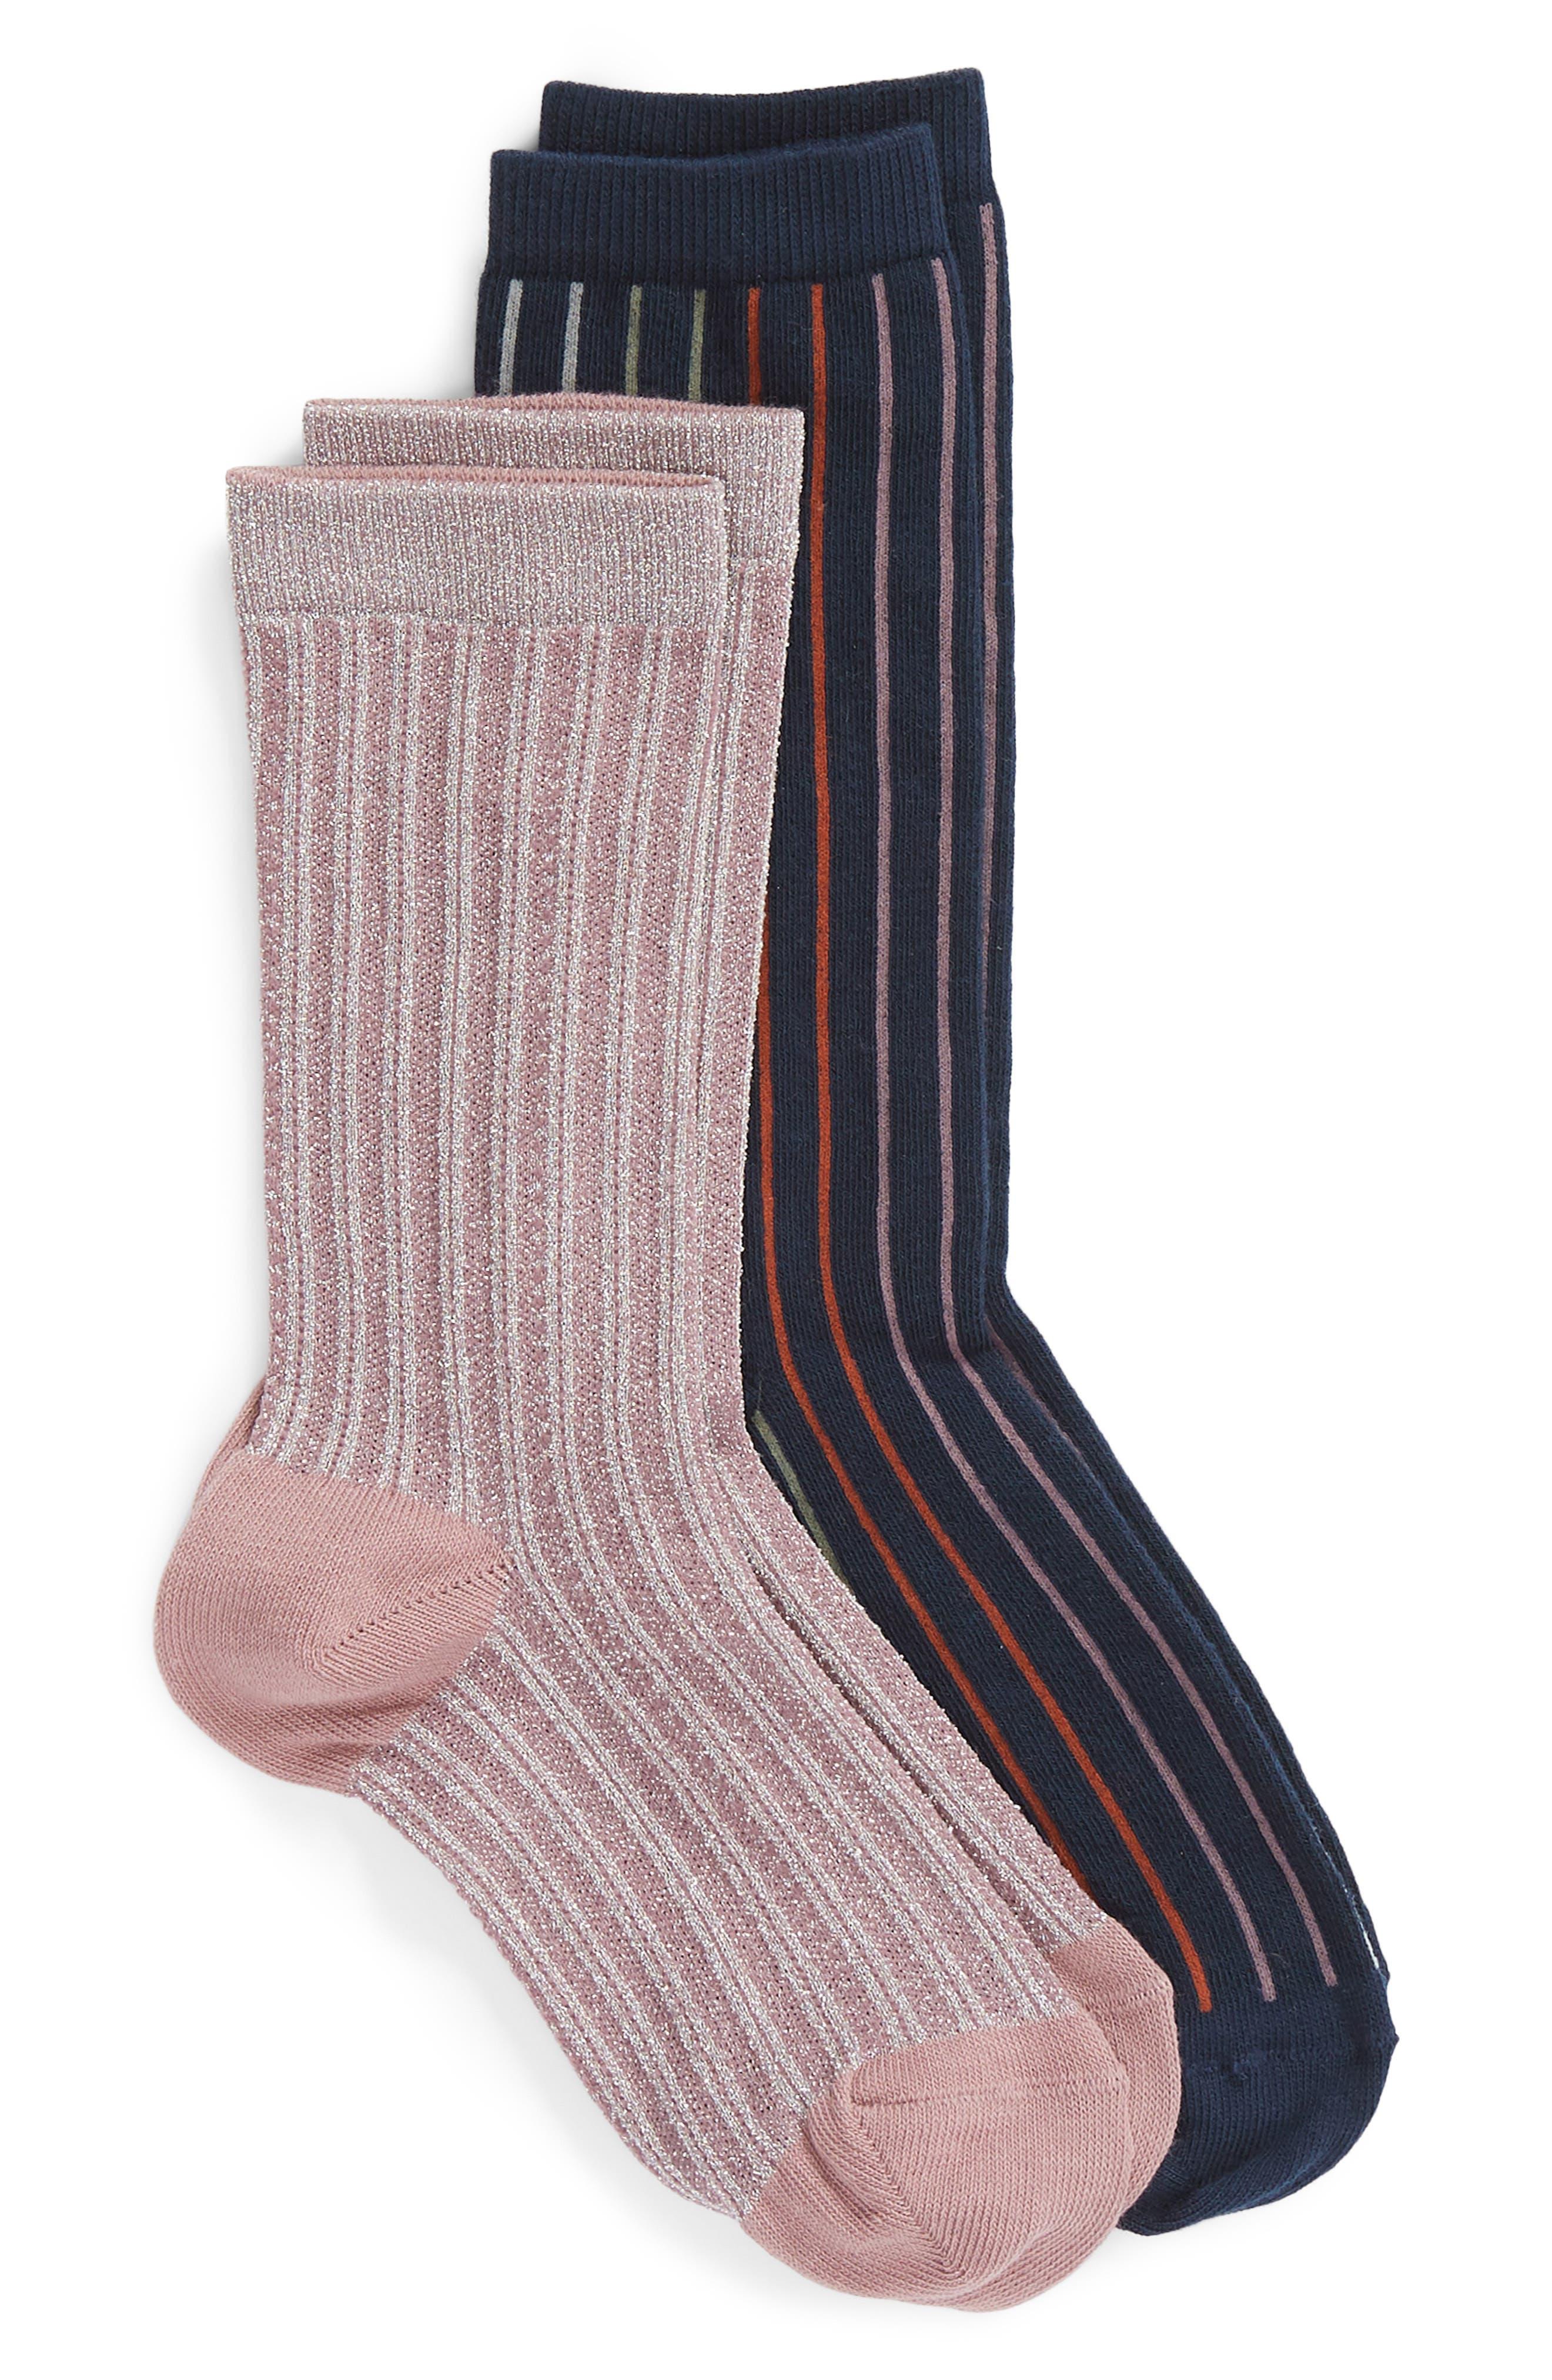 2-Pack Vertical Stripe Crew Socks,                         Main,                         color, NAVY MARITIME MULTI